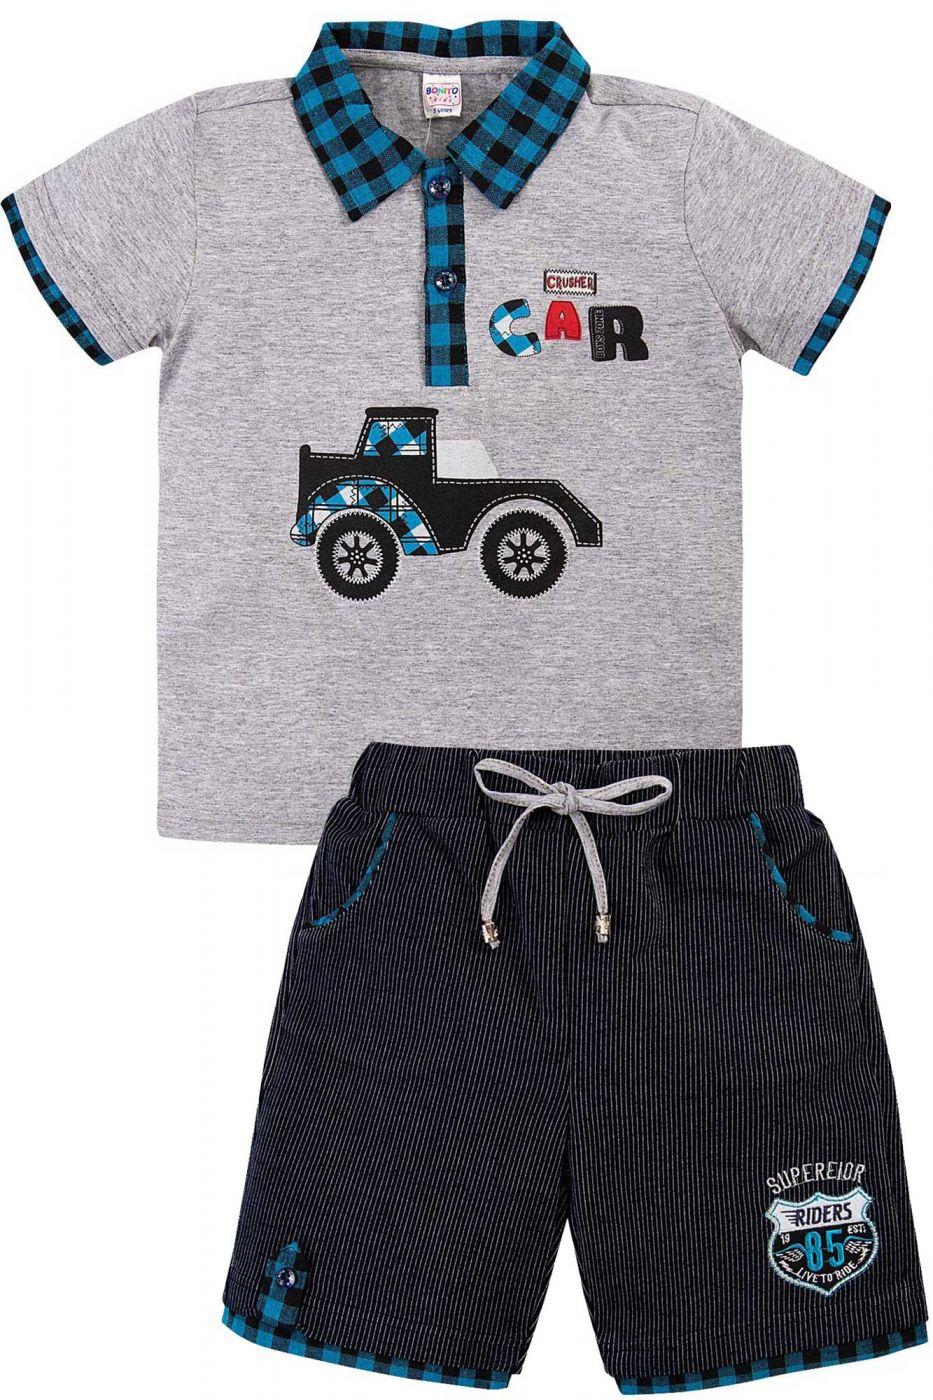 Комплект для мальчика Bonito серый-меланж/голубой